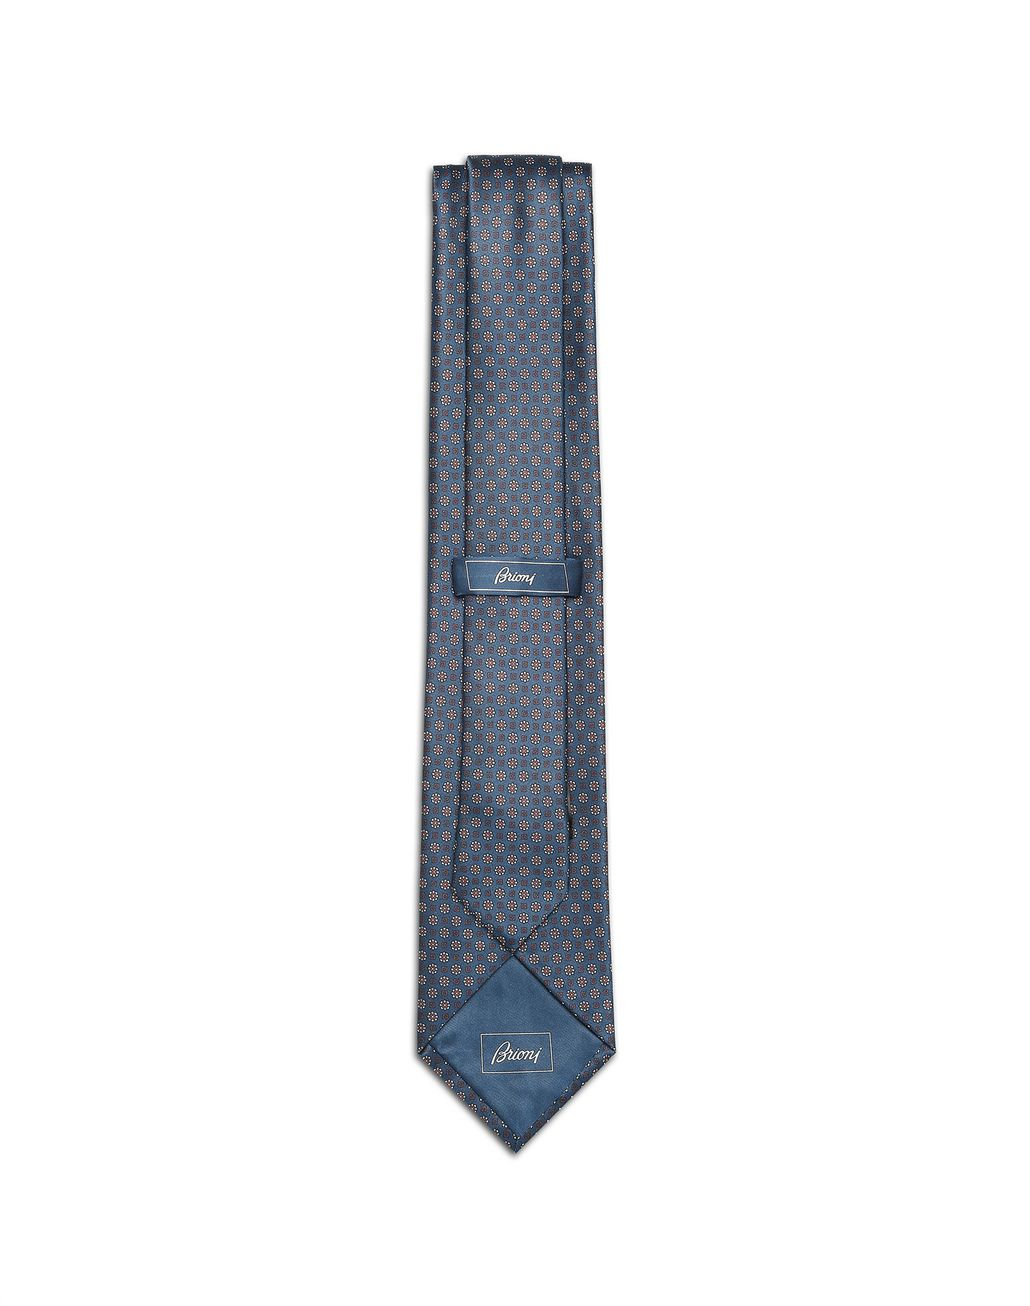 BRIONI Blaue Krawatte mit Micro-Muster Krawatte [*** pickupInStoreShippingNotGuaranteed_info ***] r